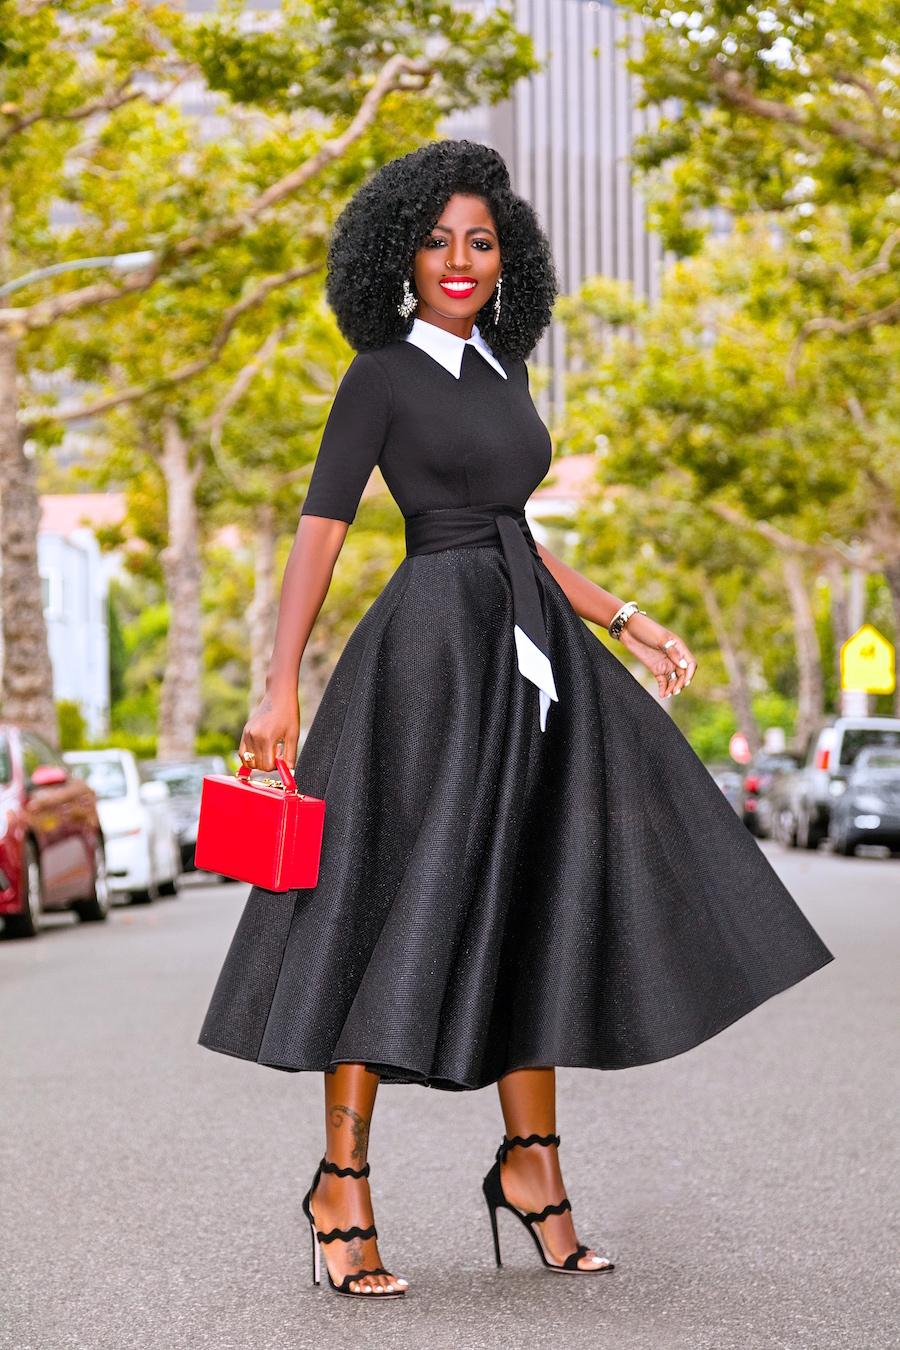 Style Pantry | Black & White Contrast 50s Midi Dress